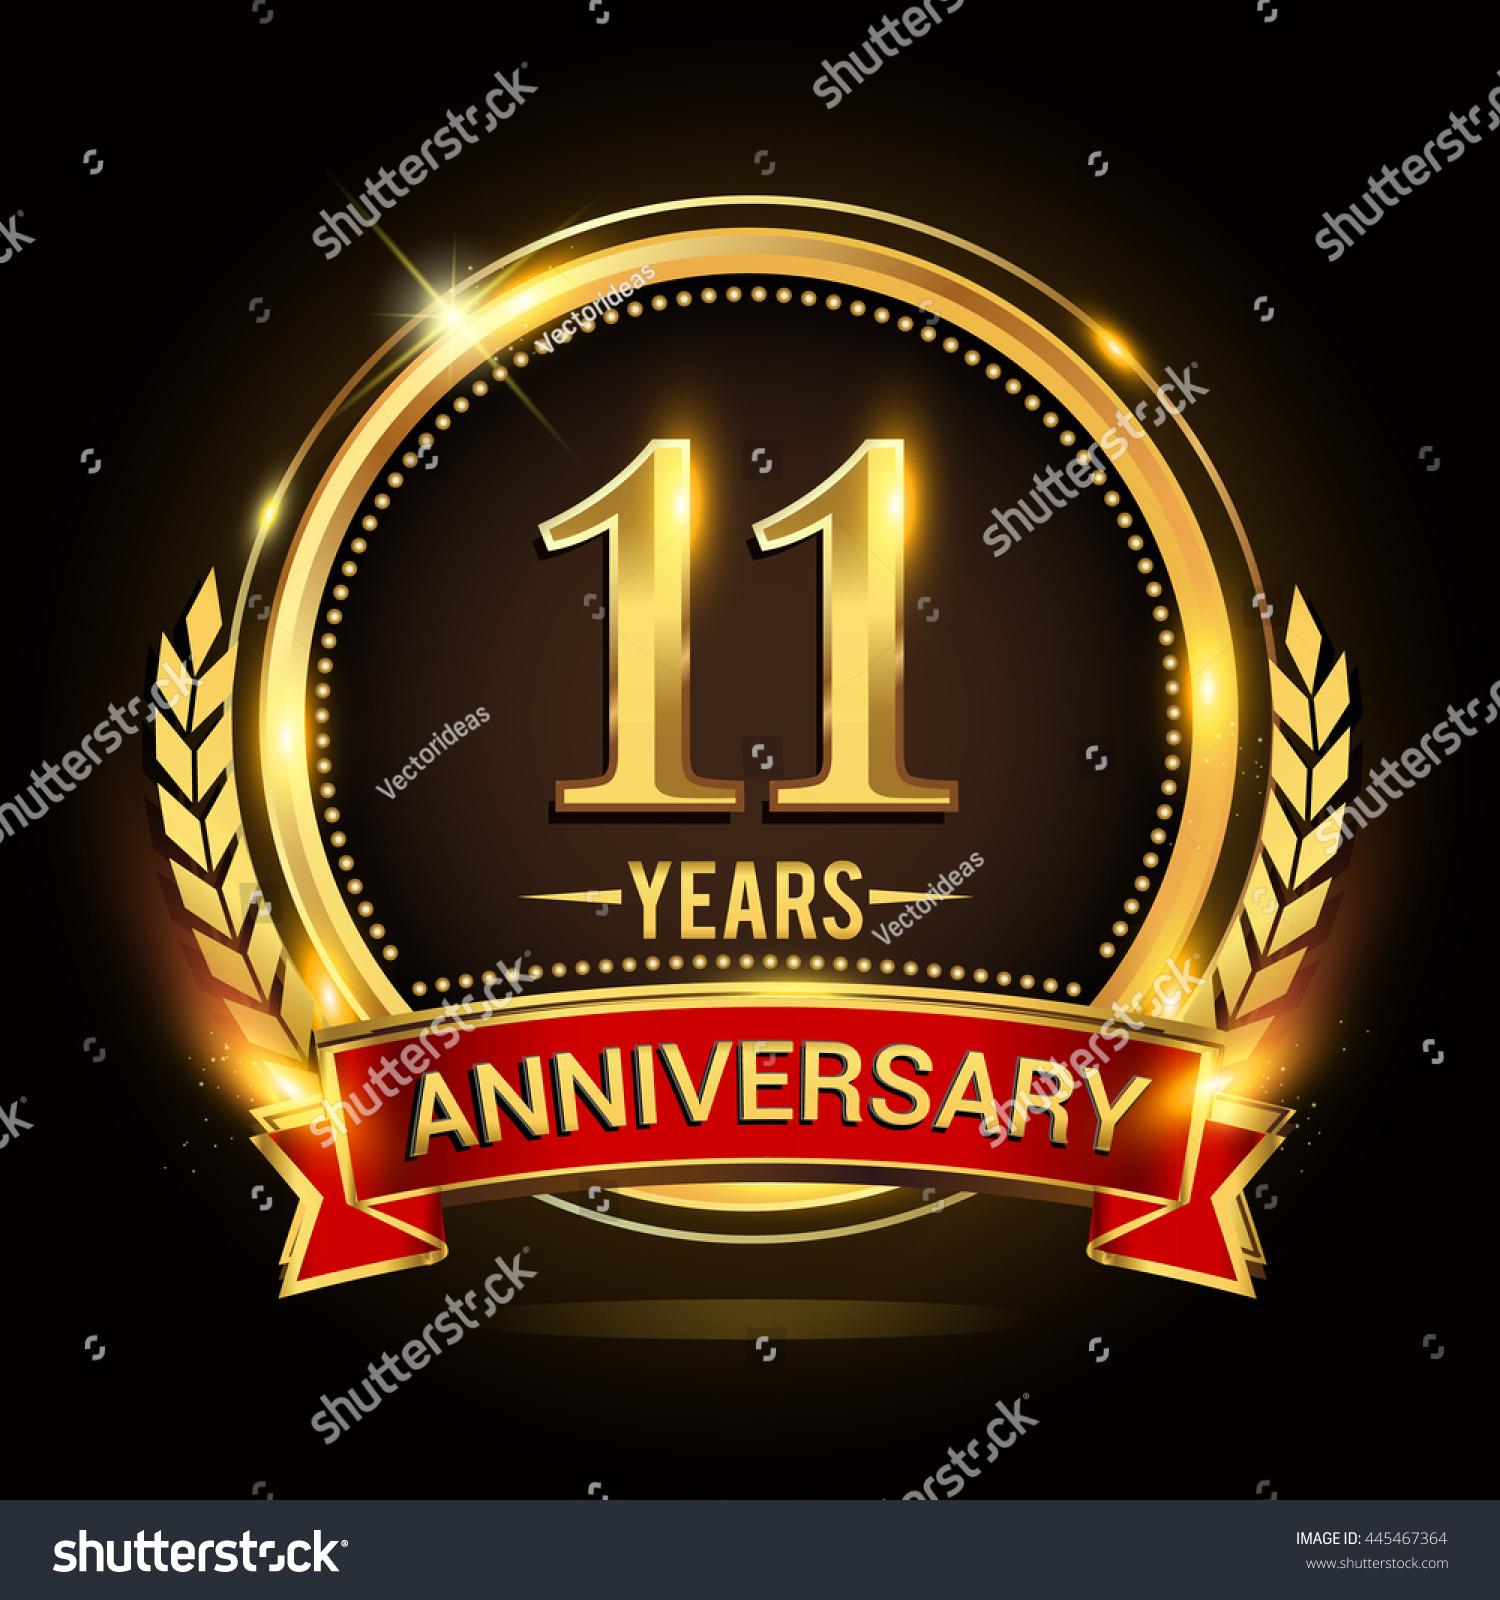 Celebrating 11 Years Anniversary Logo Golden Stock Vector ...